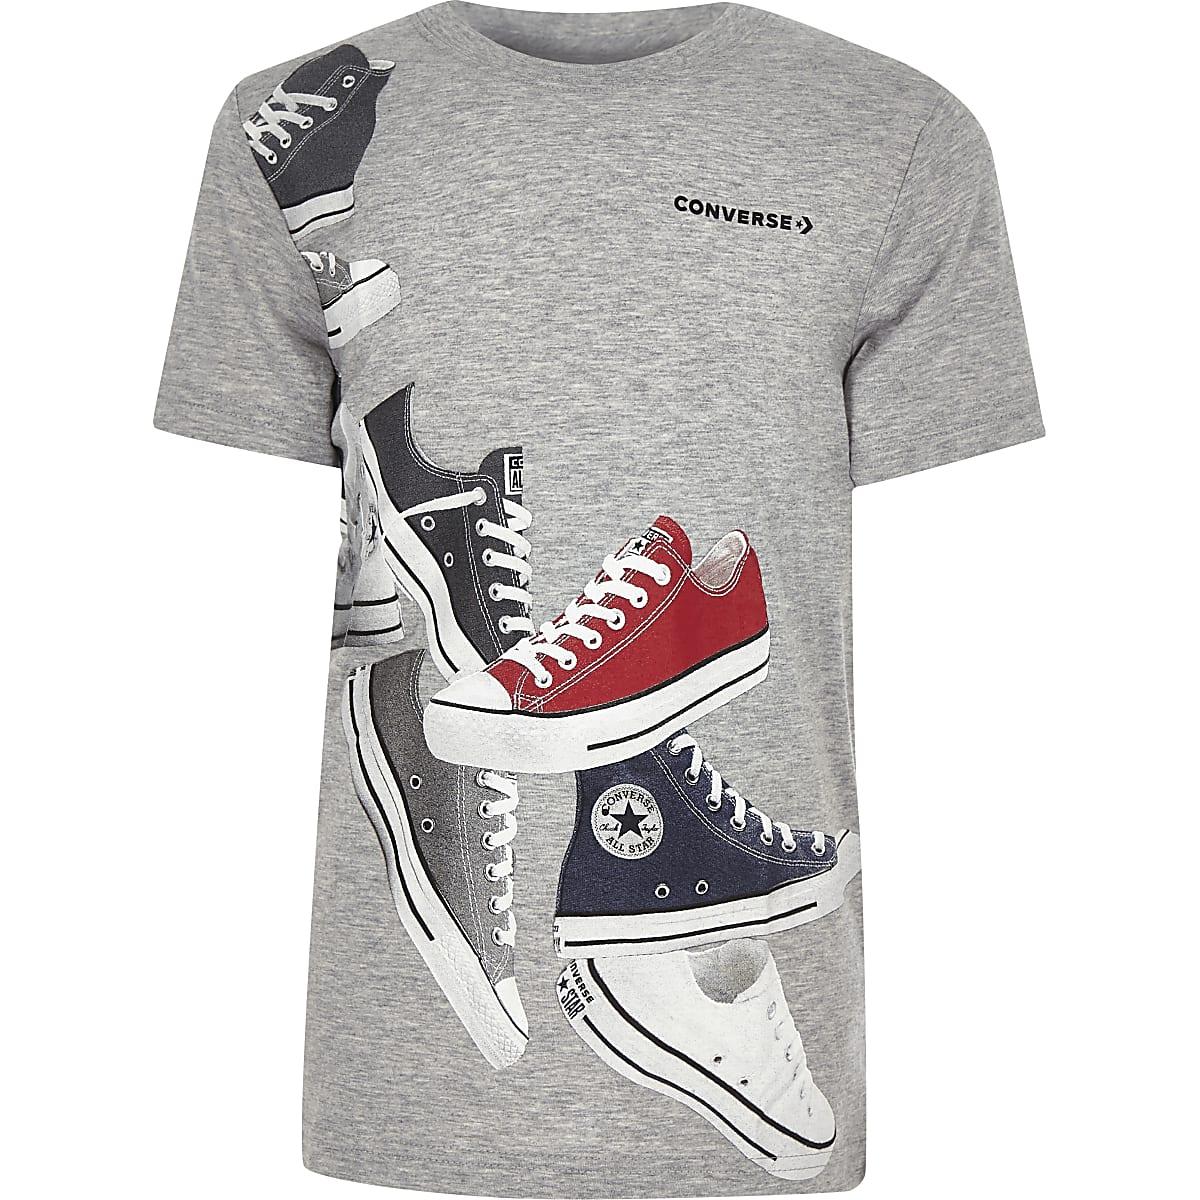 ae78c0521eda Boys Converse grey print T-shirt - T-shirts - T-Shirts   Tanks - boys